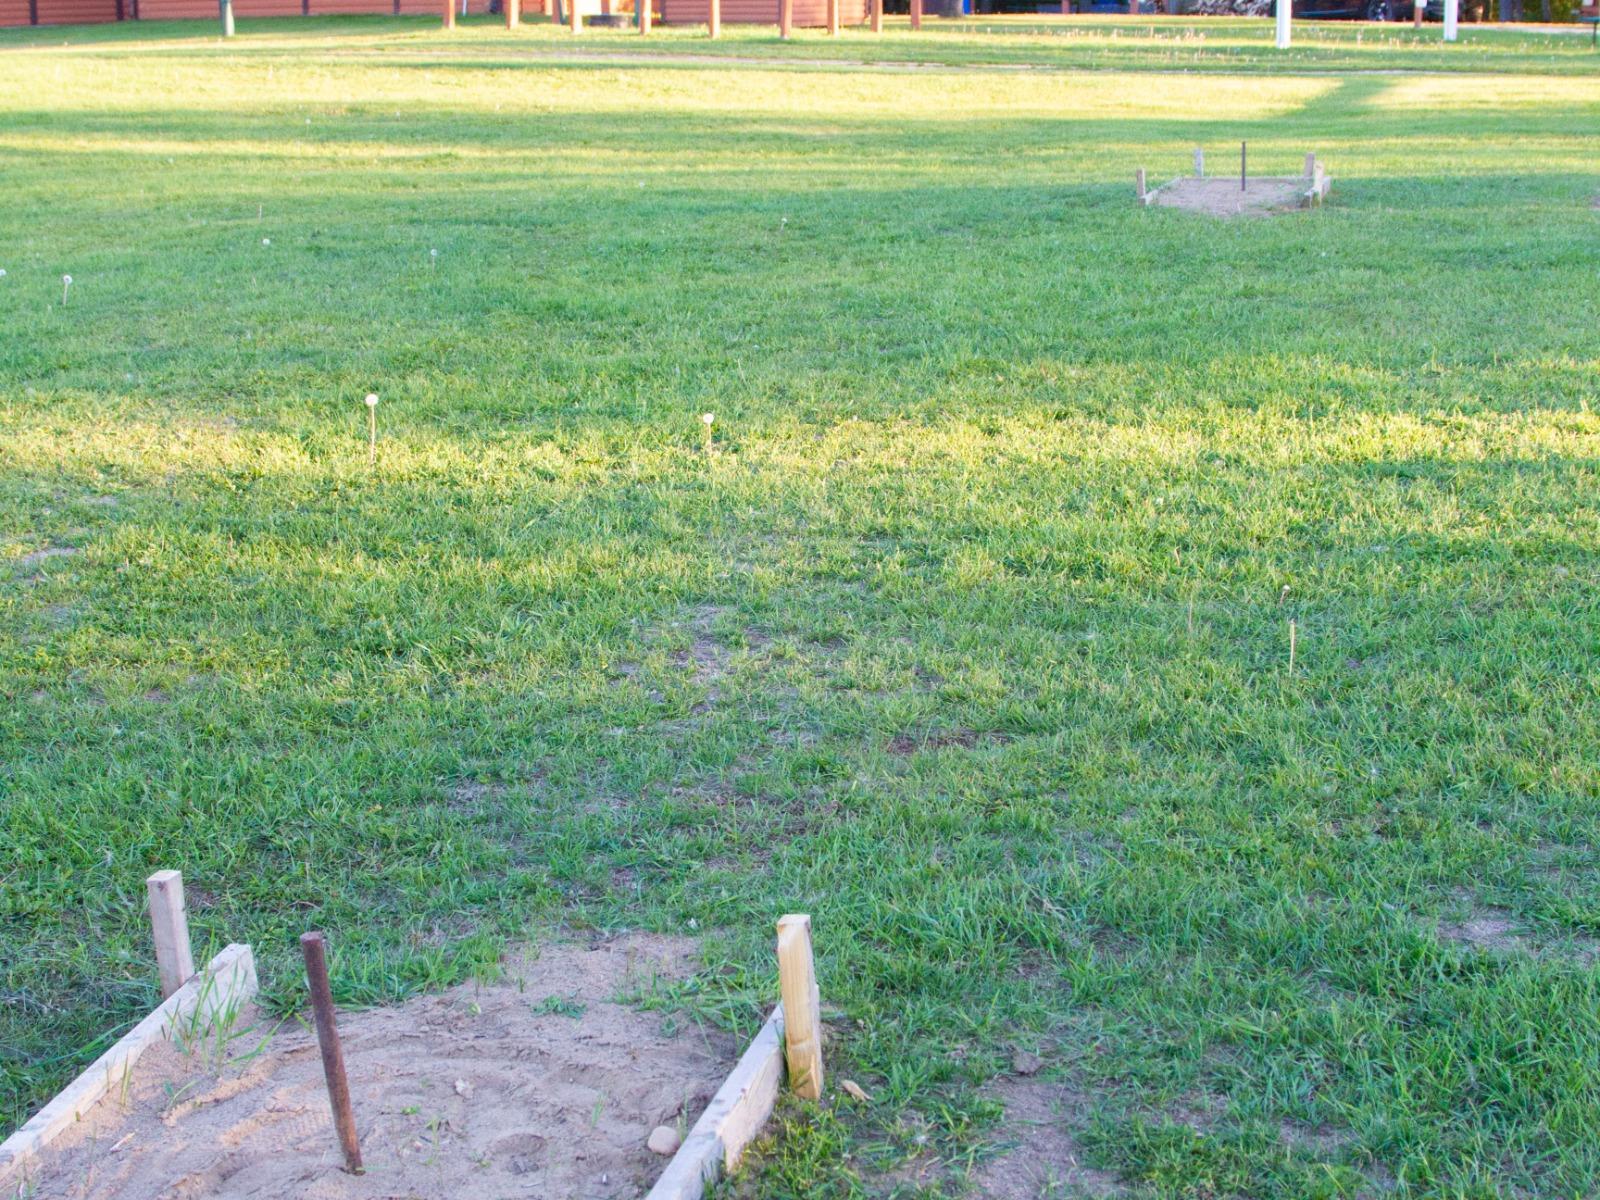 Imrie Park